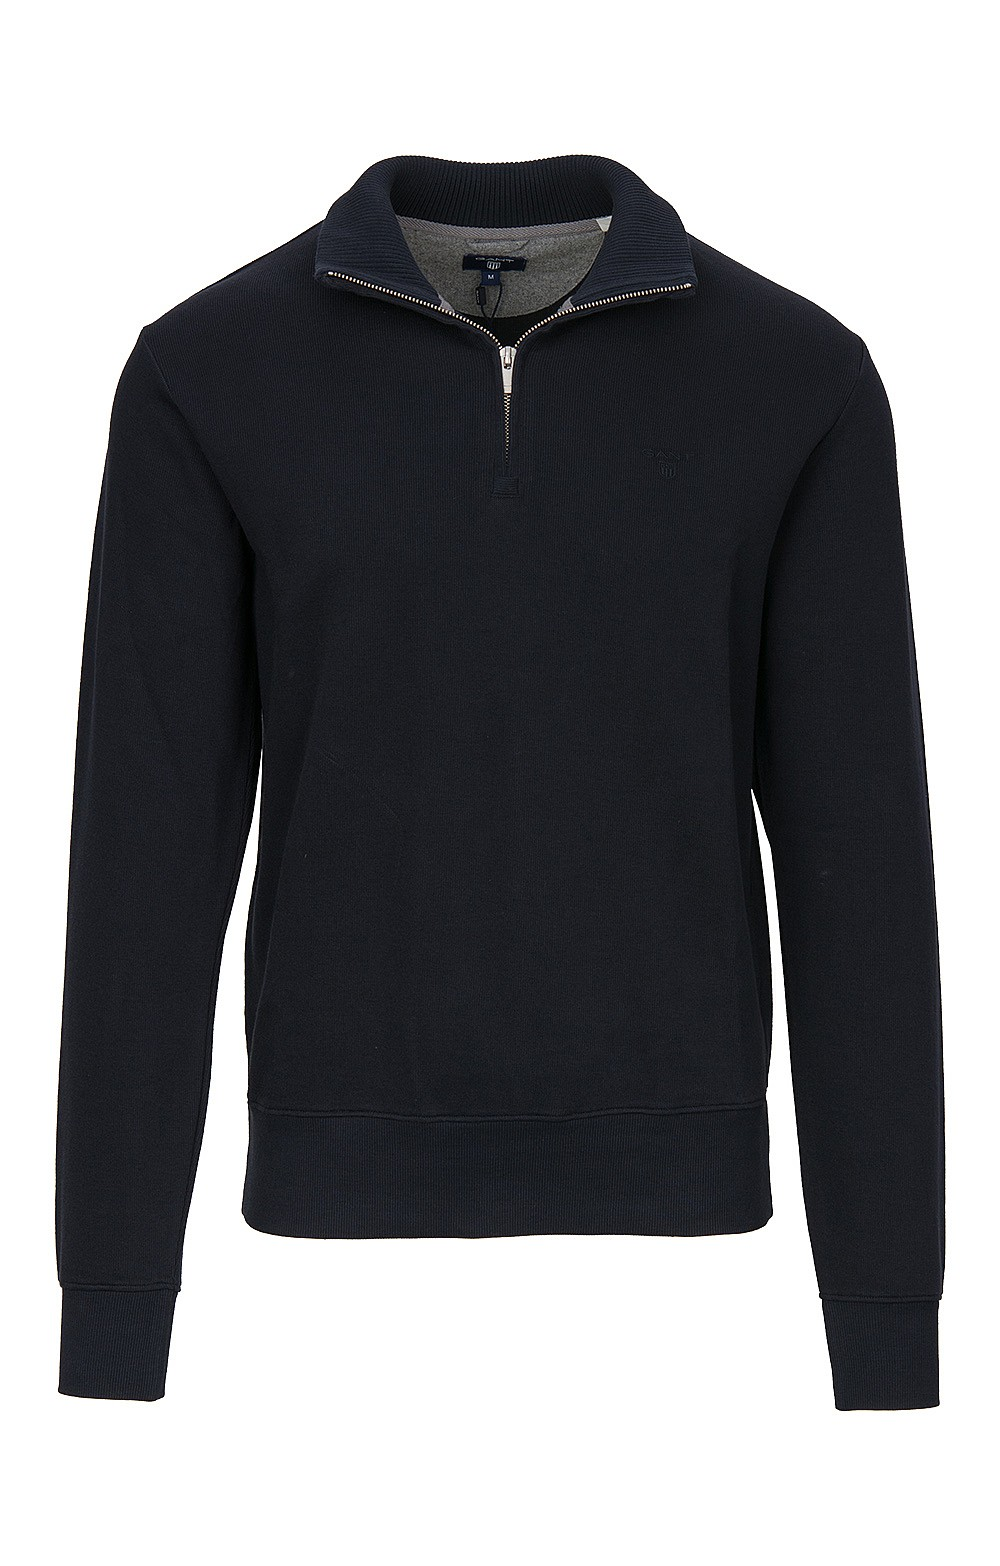 Men s Gant Sacker Rib Half-Zip Sweatshirt - House of Bruar 993cb08ac